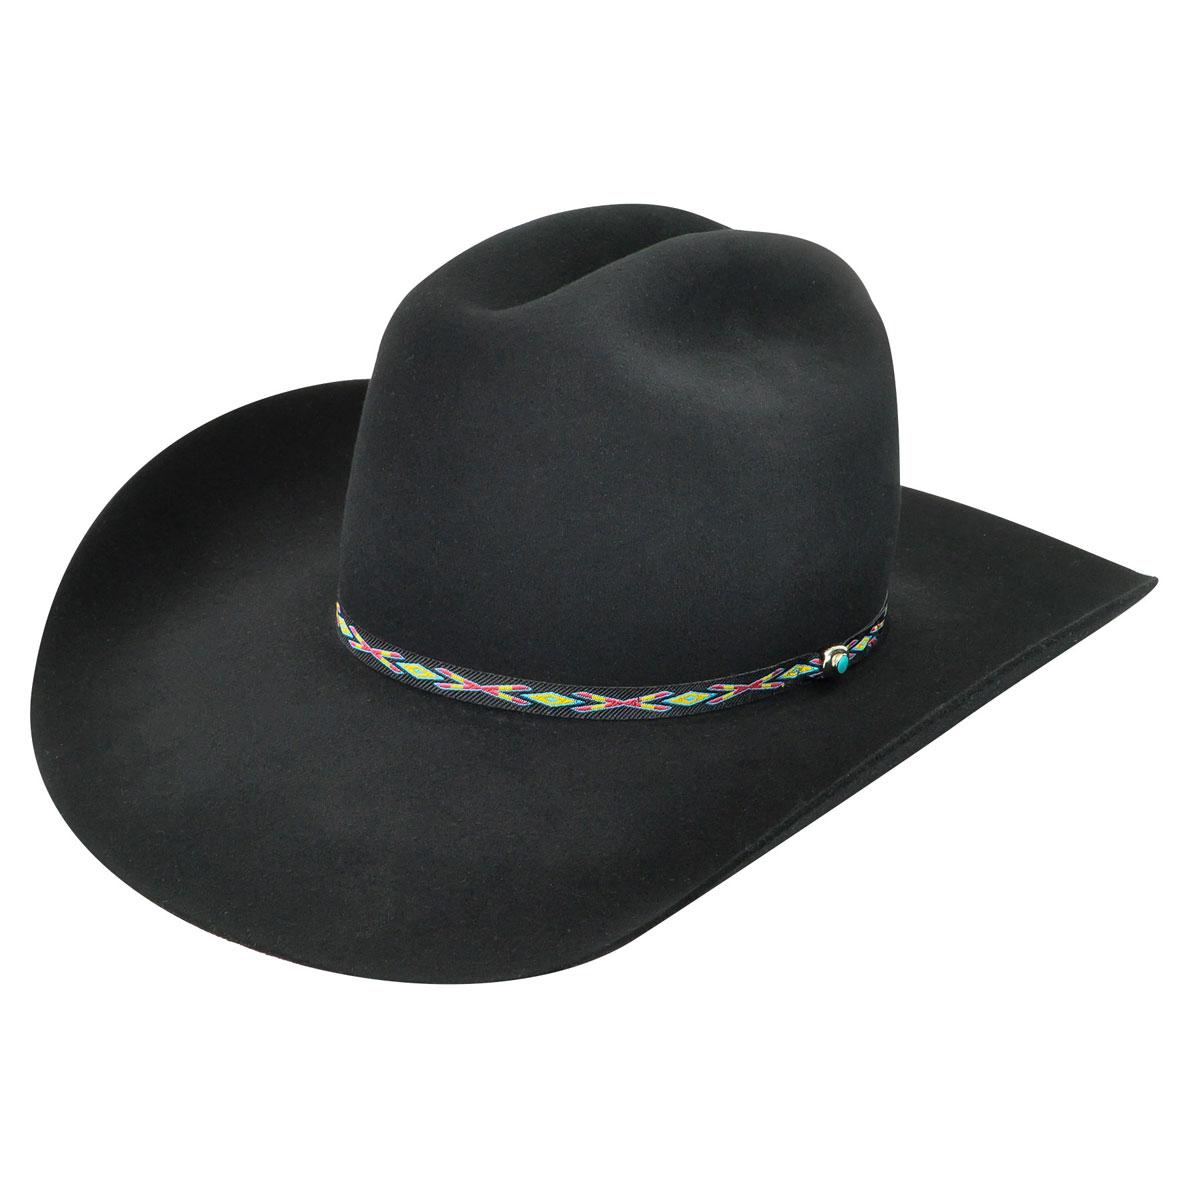 Bailey Western Bridger 3X Western Hat in Black